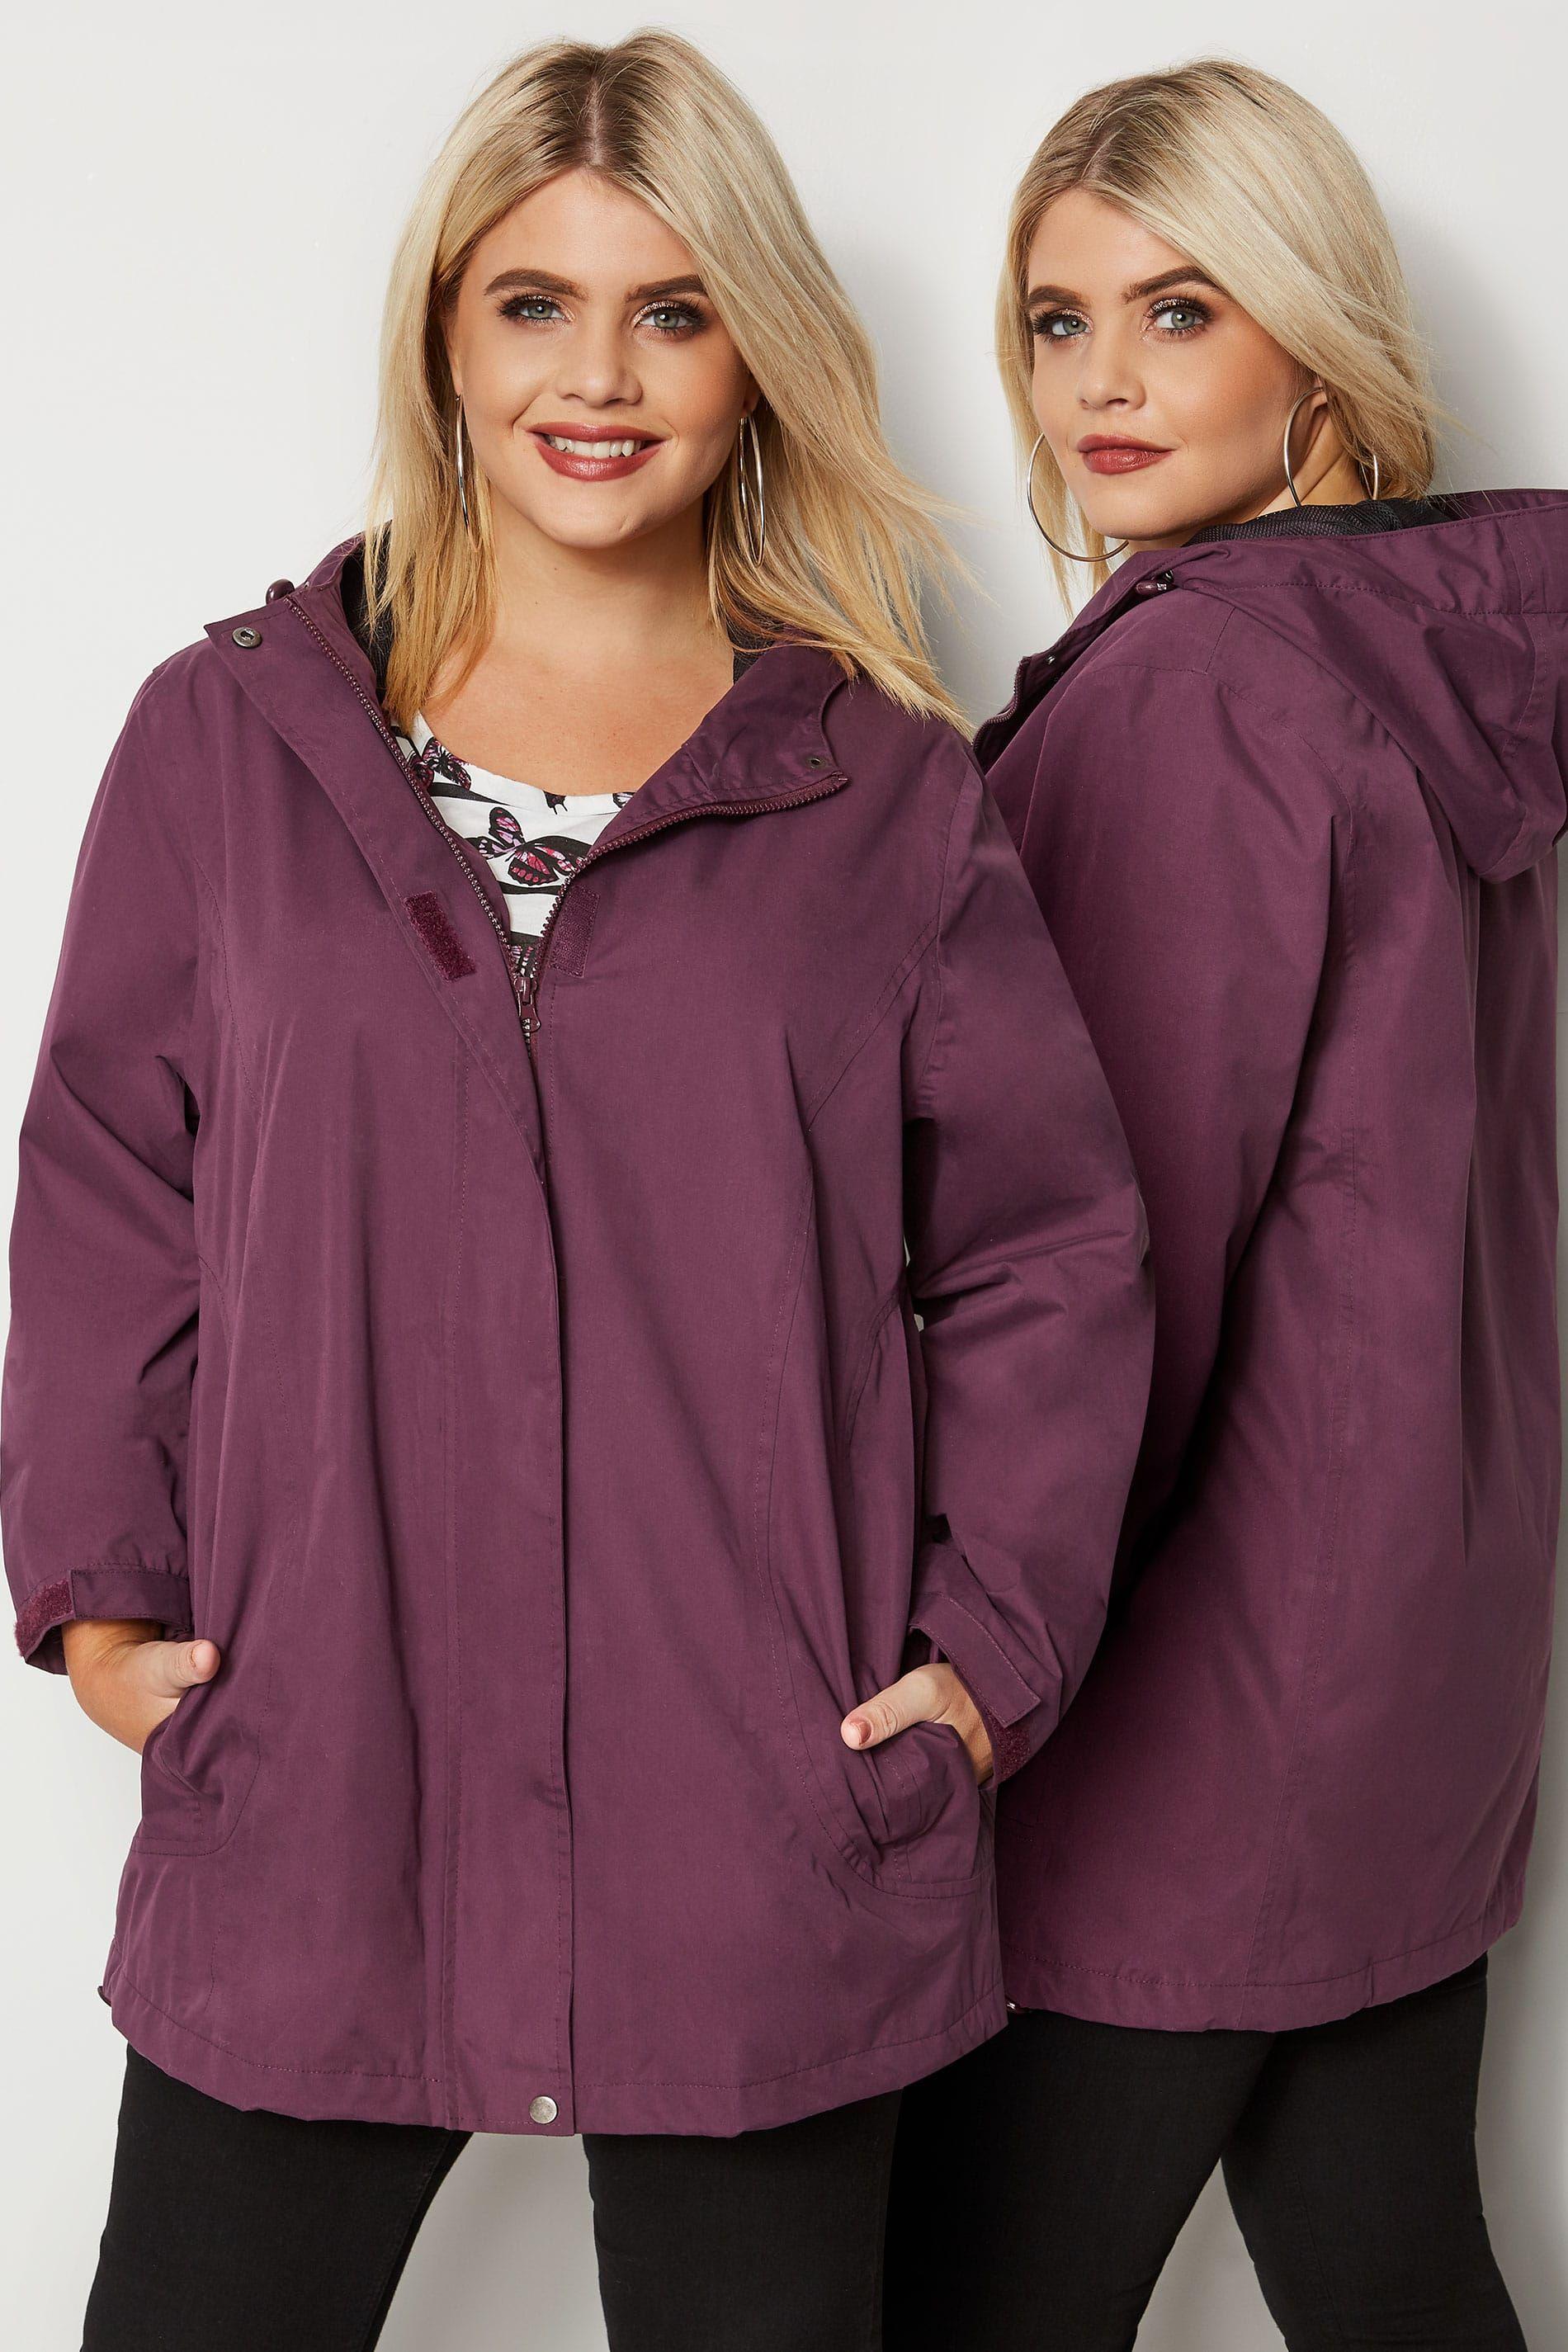 Yours Clothing Womens Ladies Plus Size Coat Jacket Zip Hooded UK 16-36